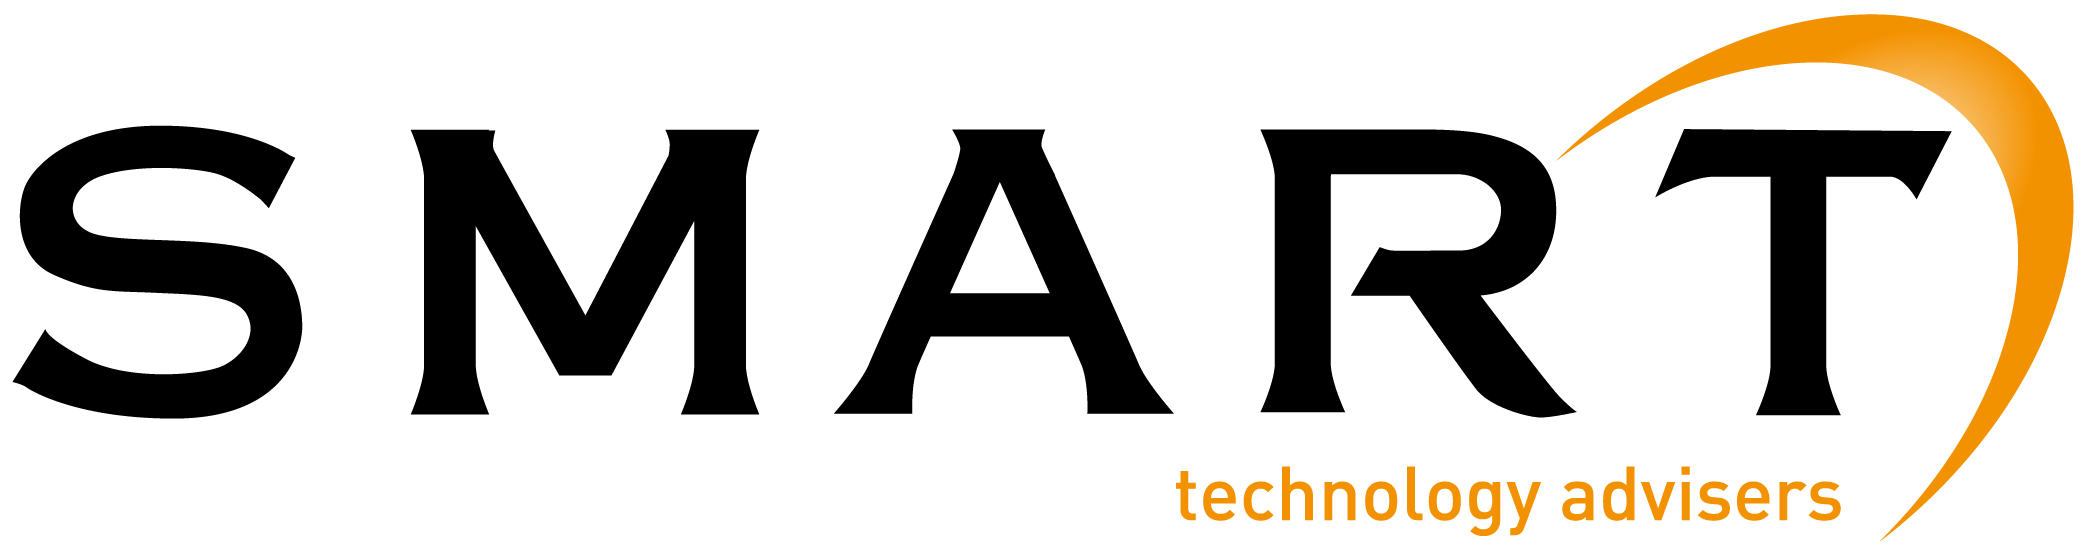 Smart Technology Advisers (black).png